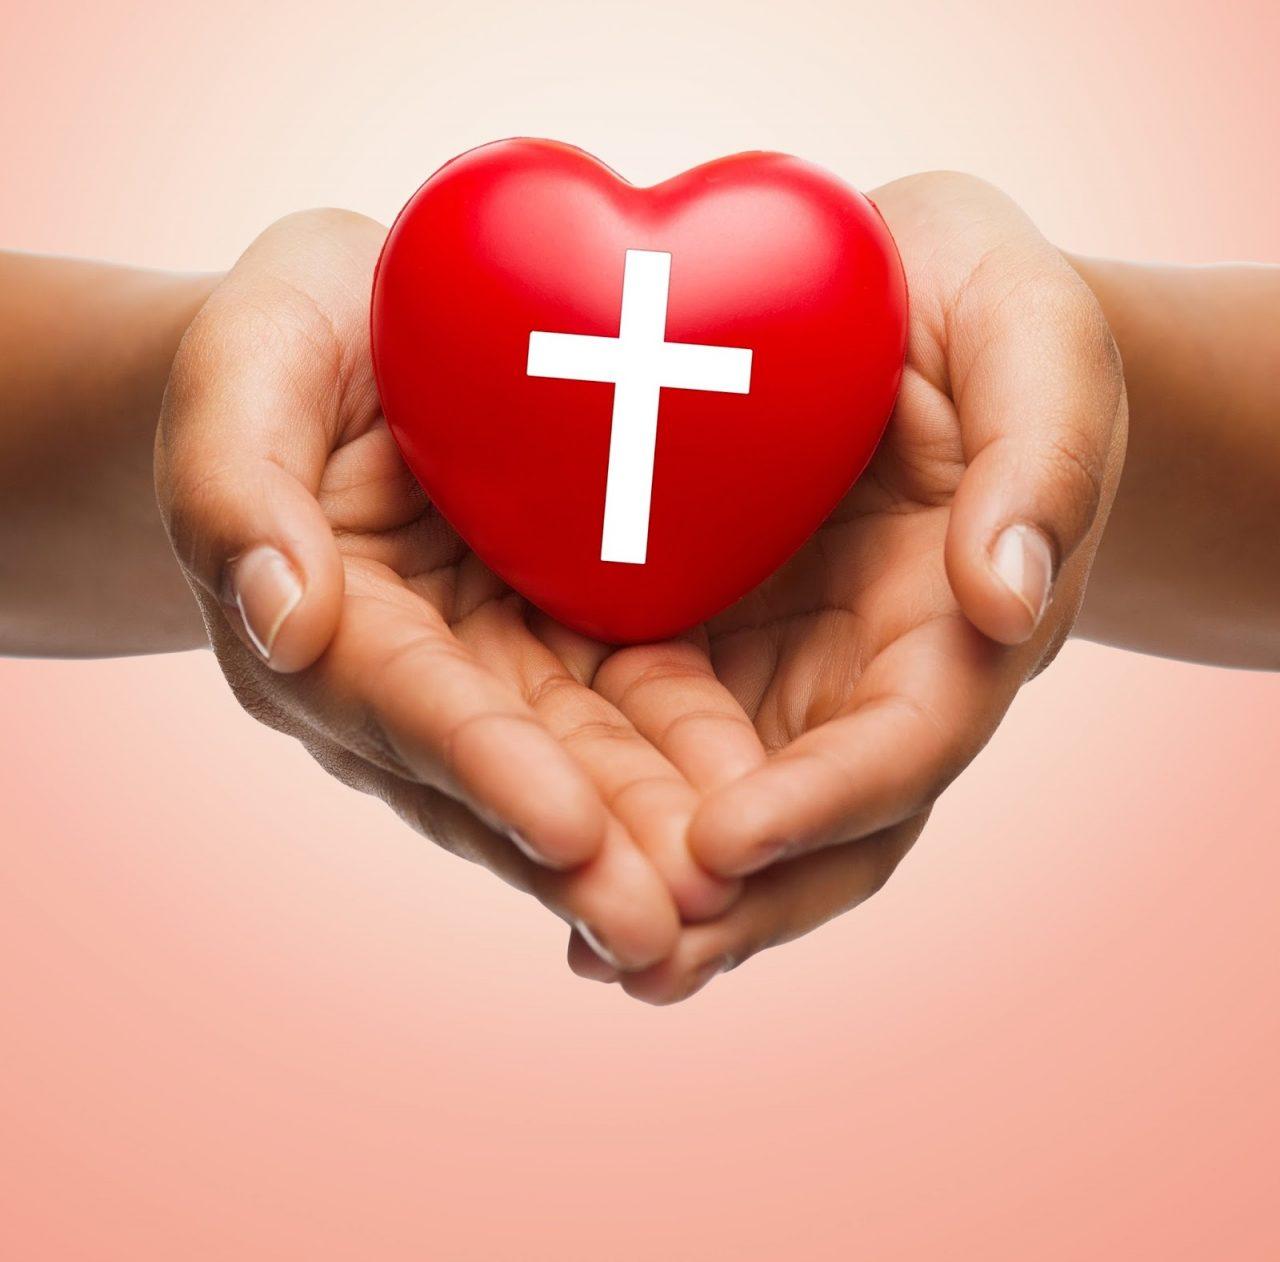 holding heart cross Courtesy of Syda ProductionsShutterstockcom _280428407